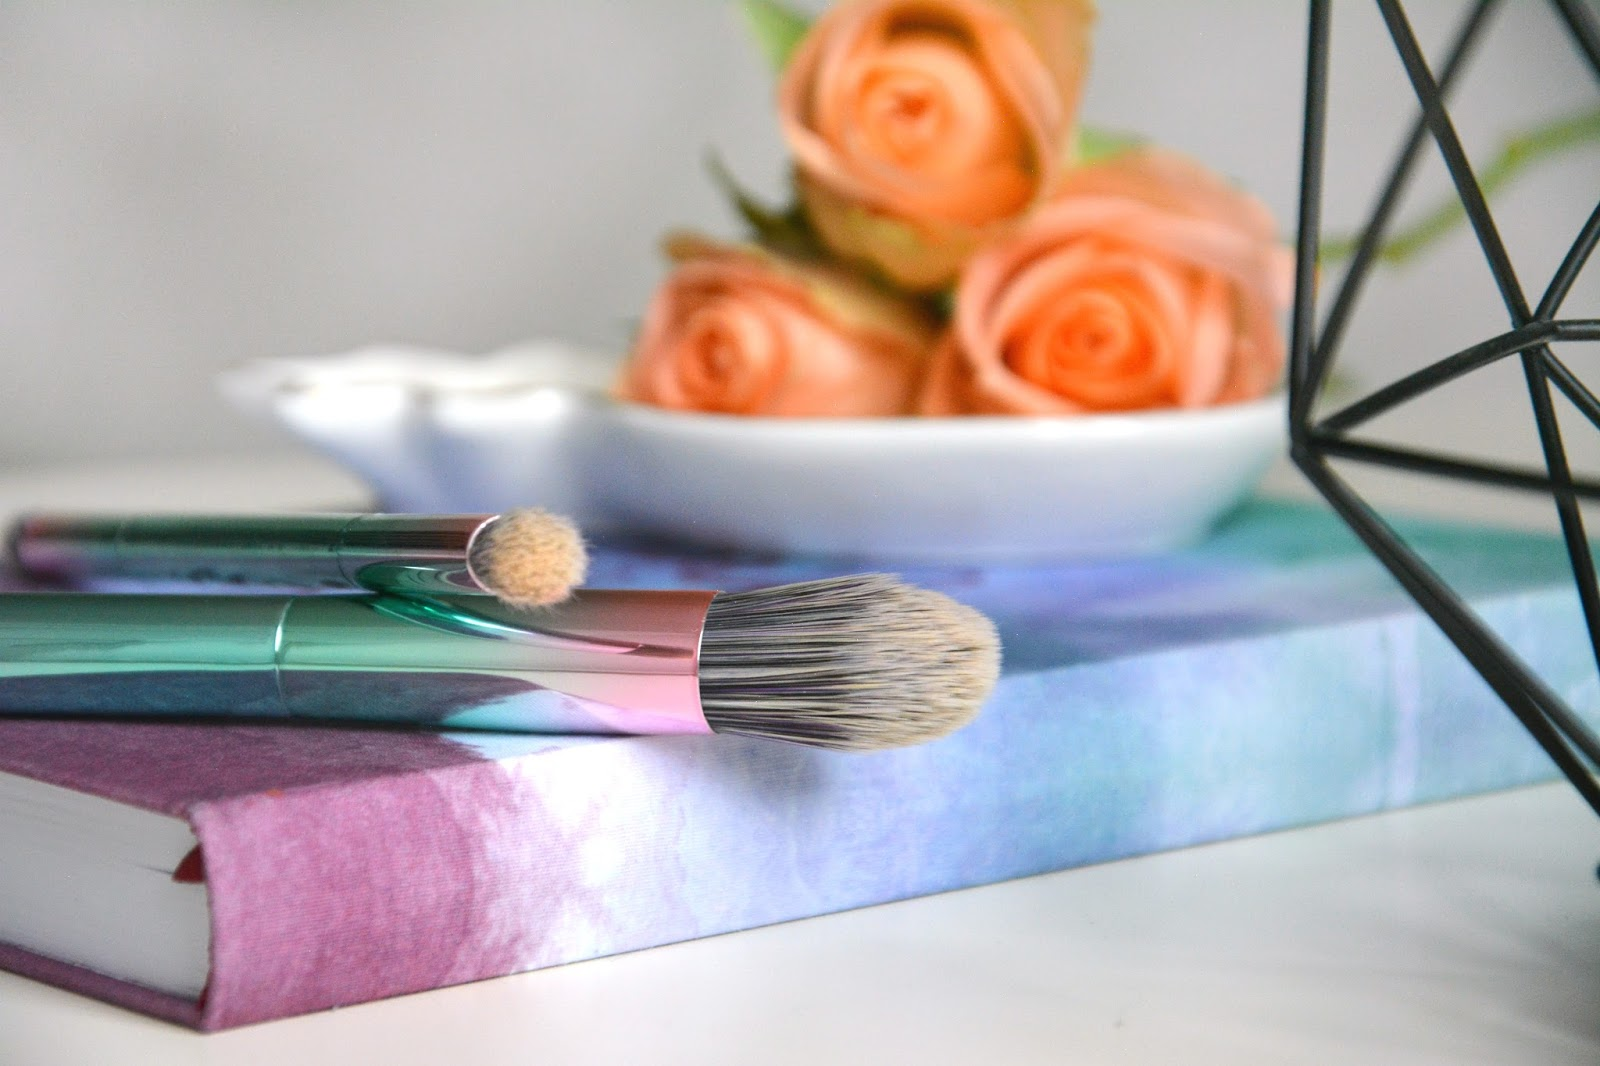 Primark Decoration; Primark #Instafamous brushes; Hema Notebook; Fresh Roses; Primark Pineapple Dish